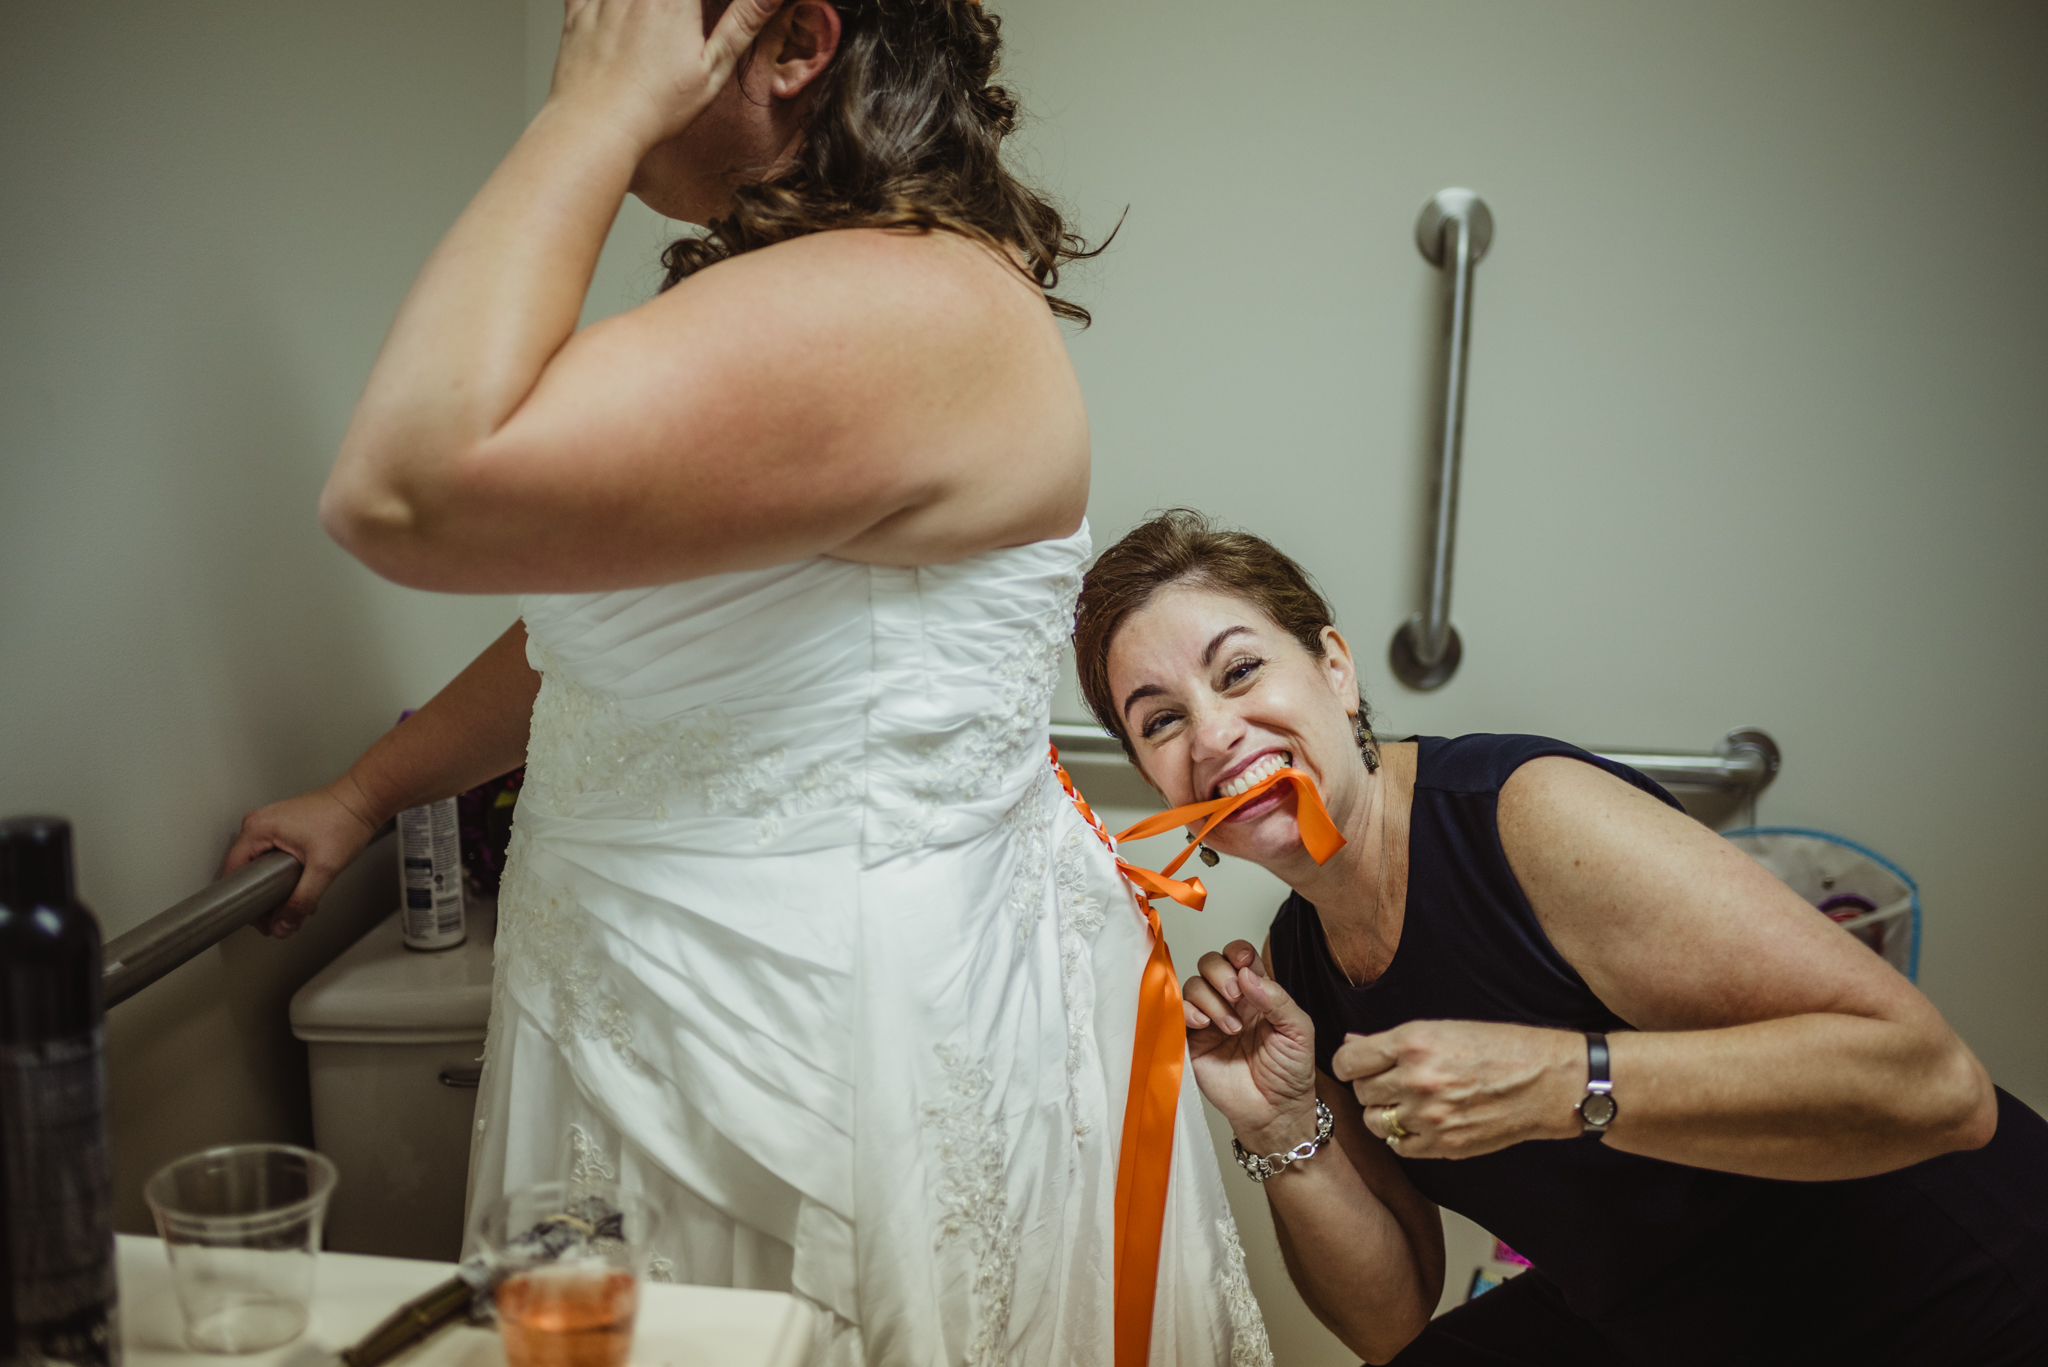 raleigh-wedding-bride-getting-ready-cd-1.jpg